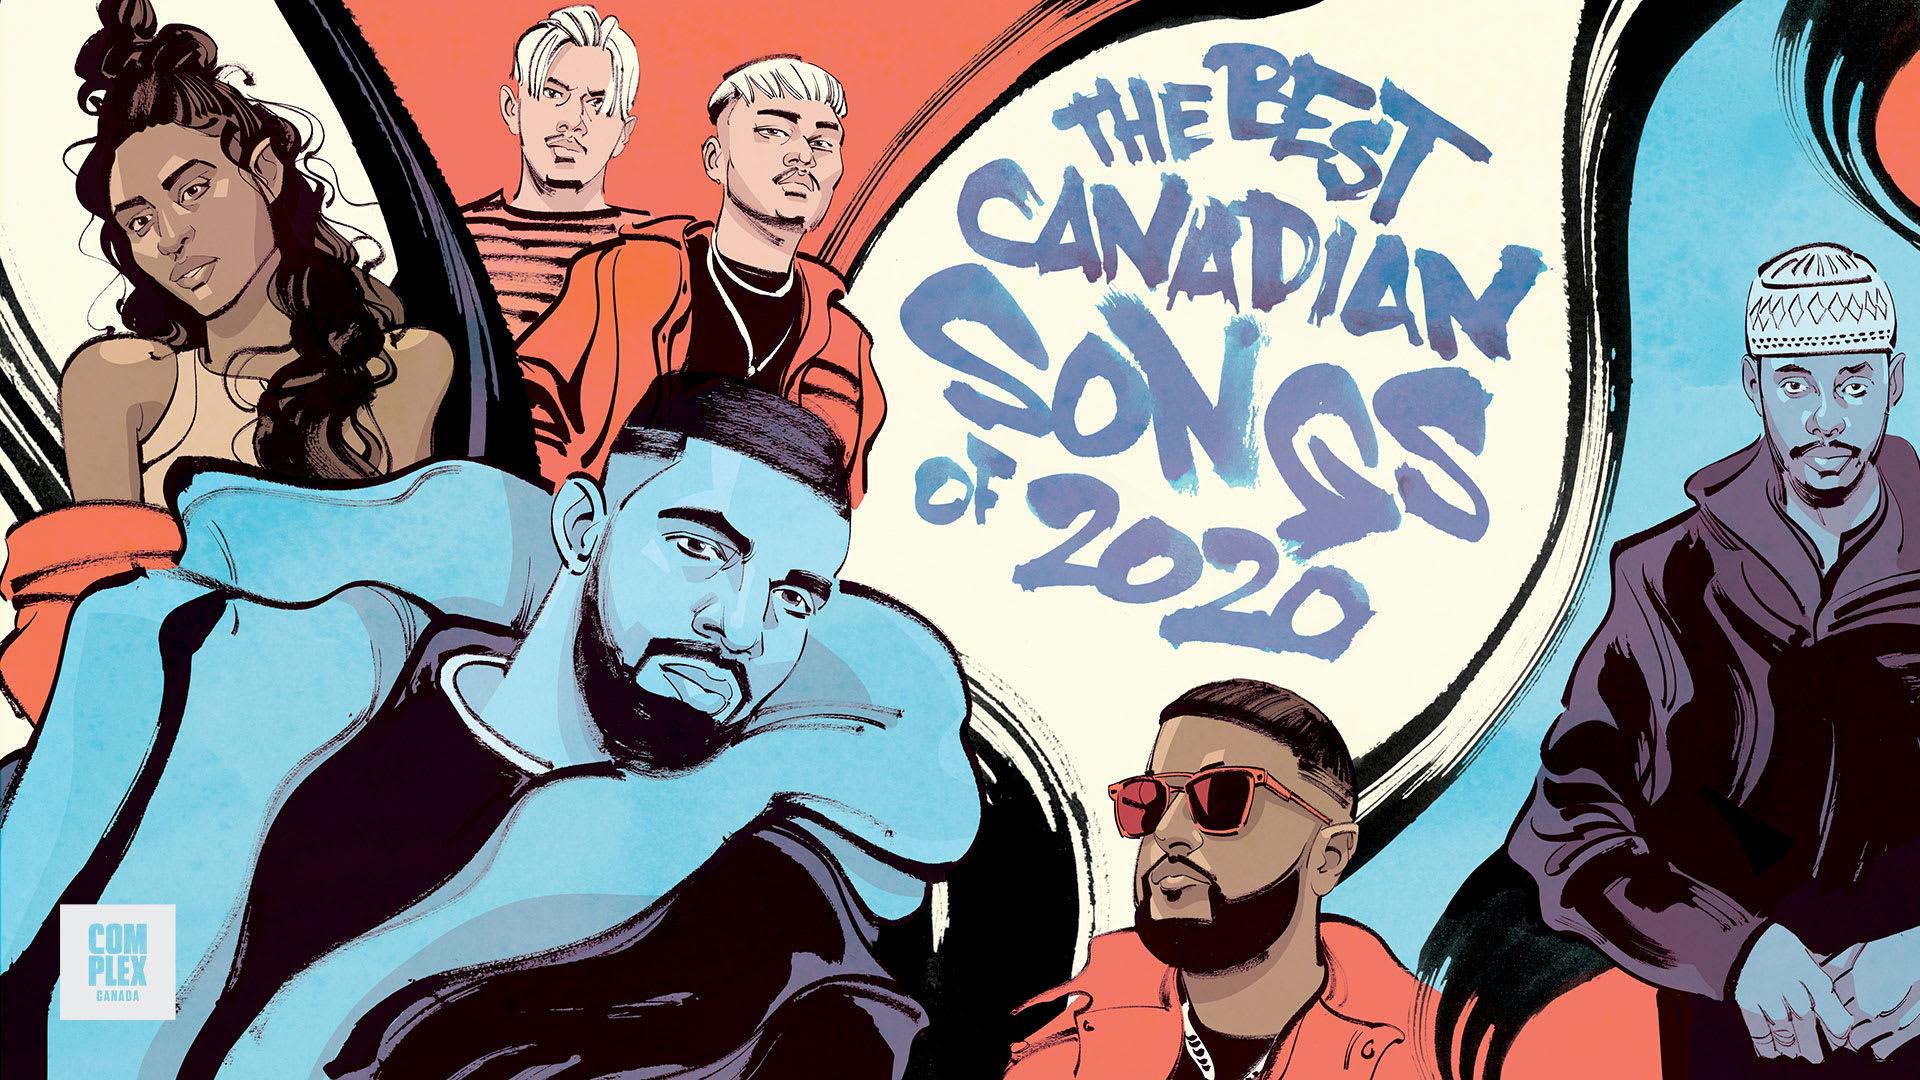 best-canadian-songs-2020-drake-nav-mustafa-manila-grey-jessie-reyez